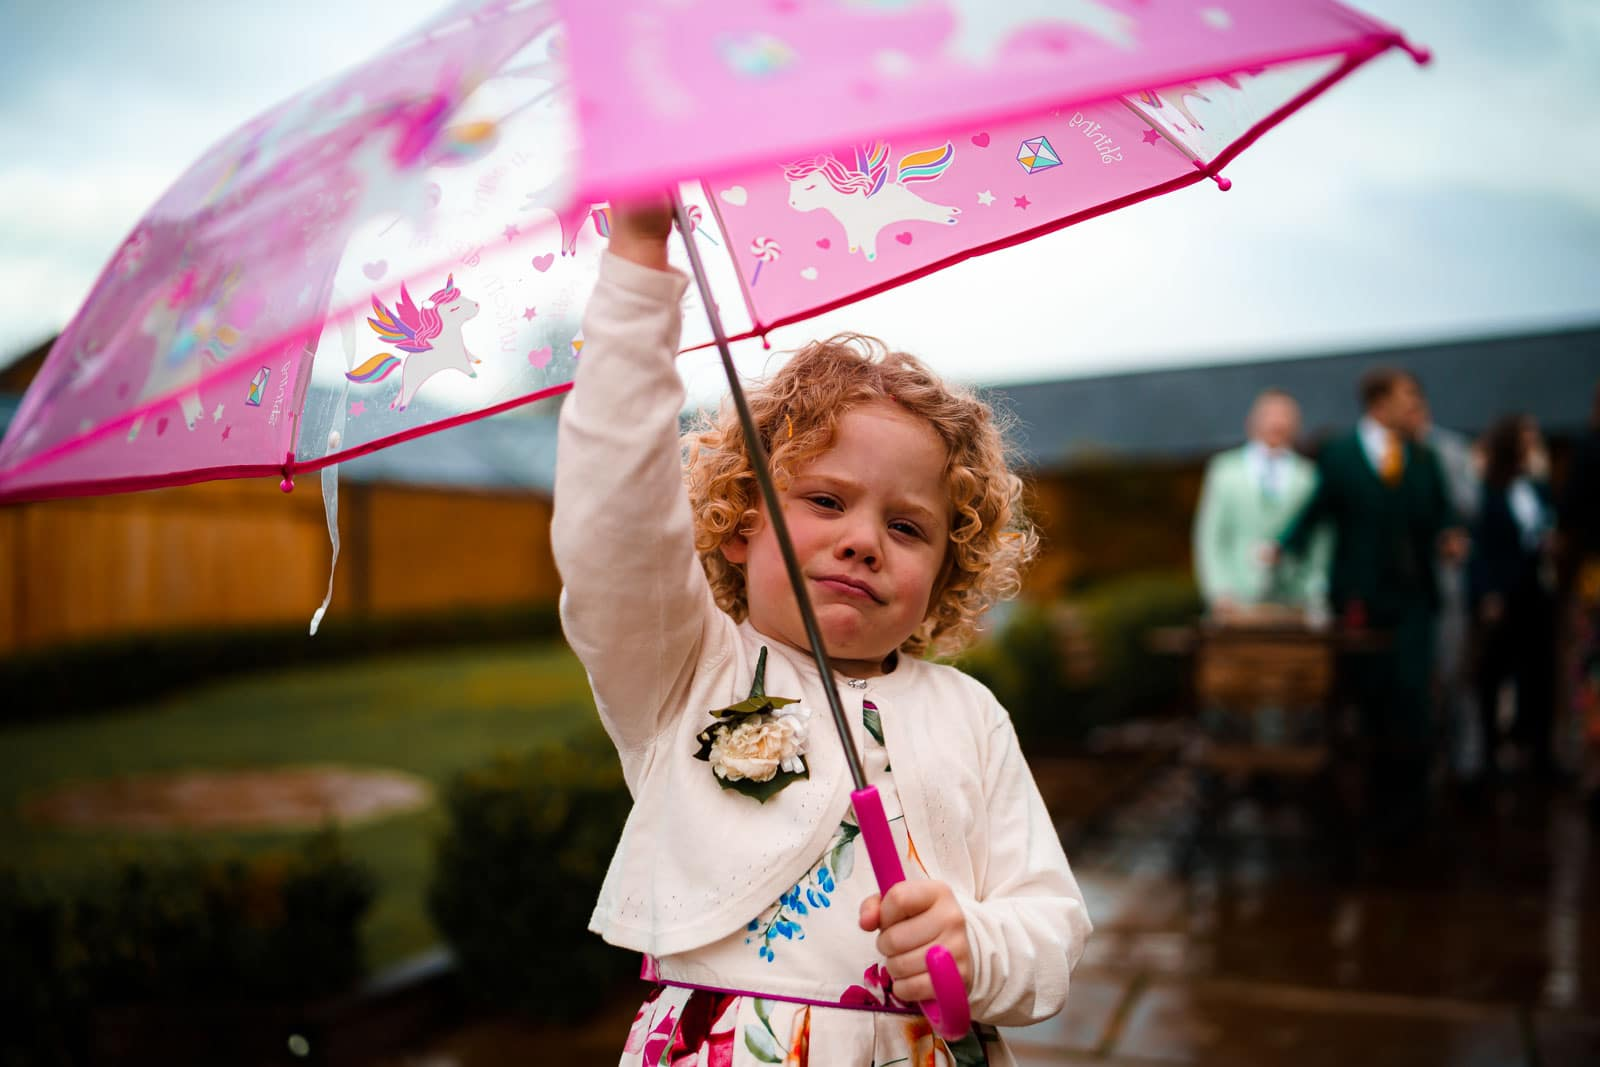 Child holding aloft a umbrella because it